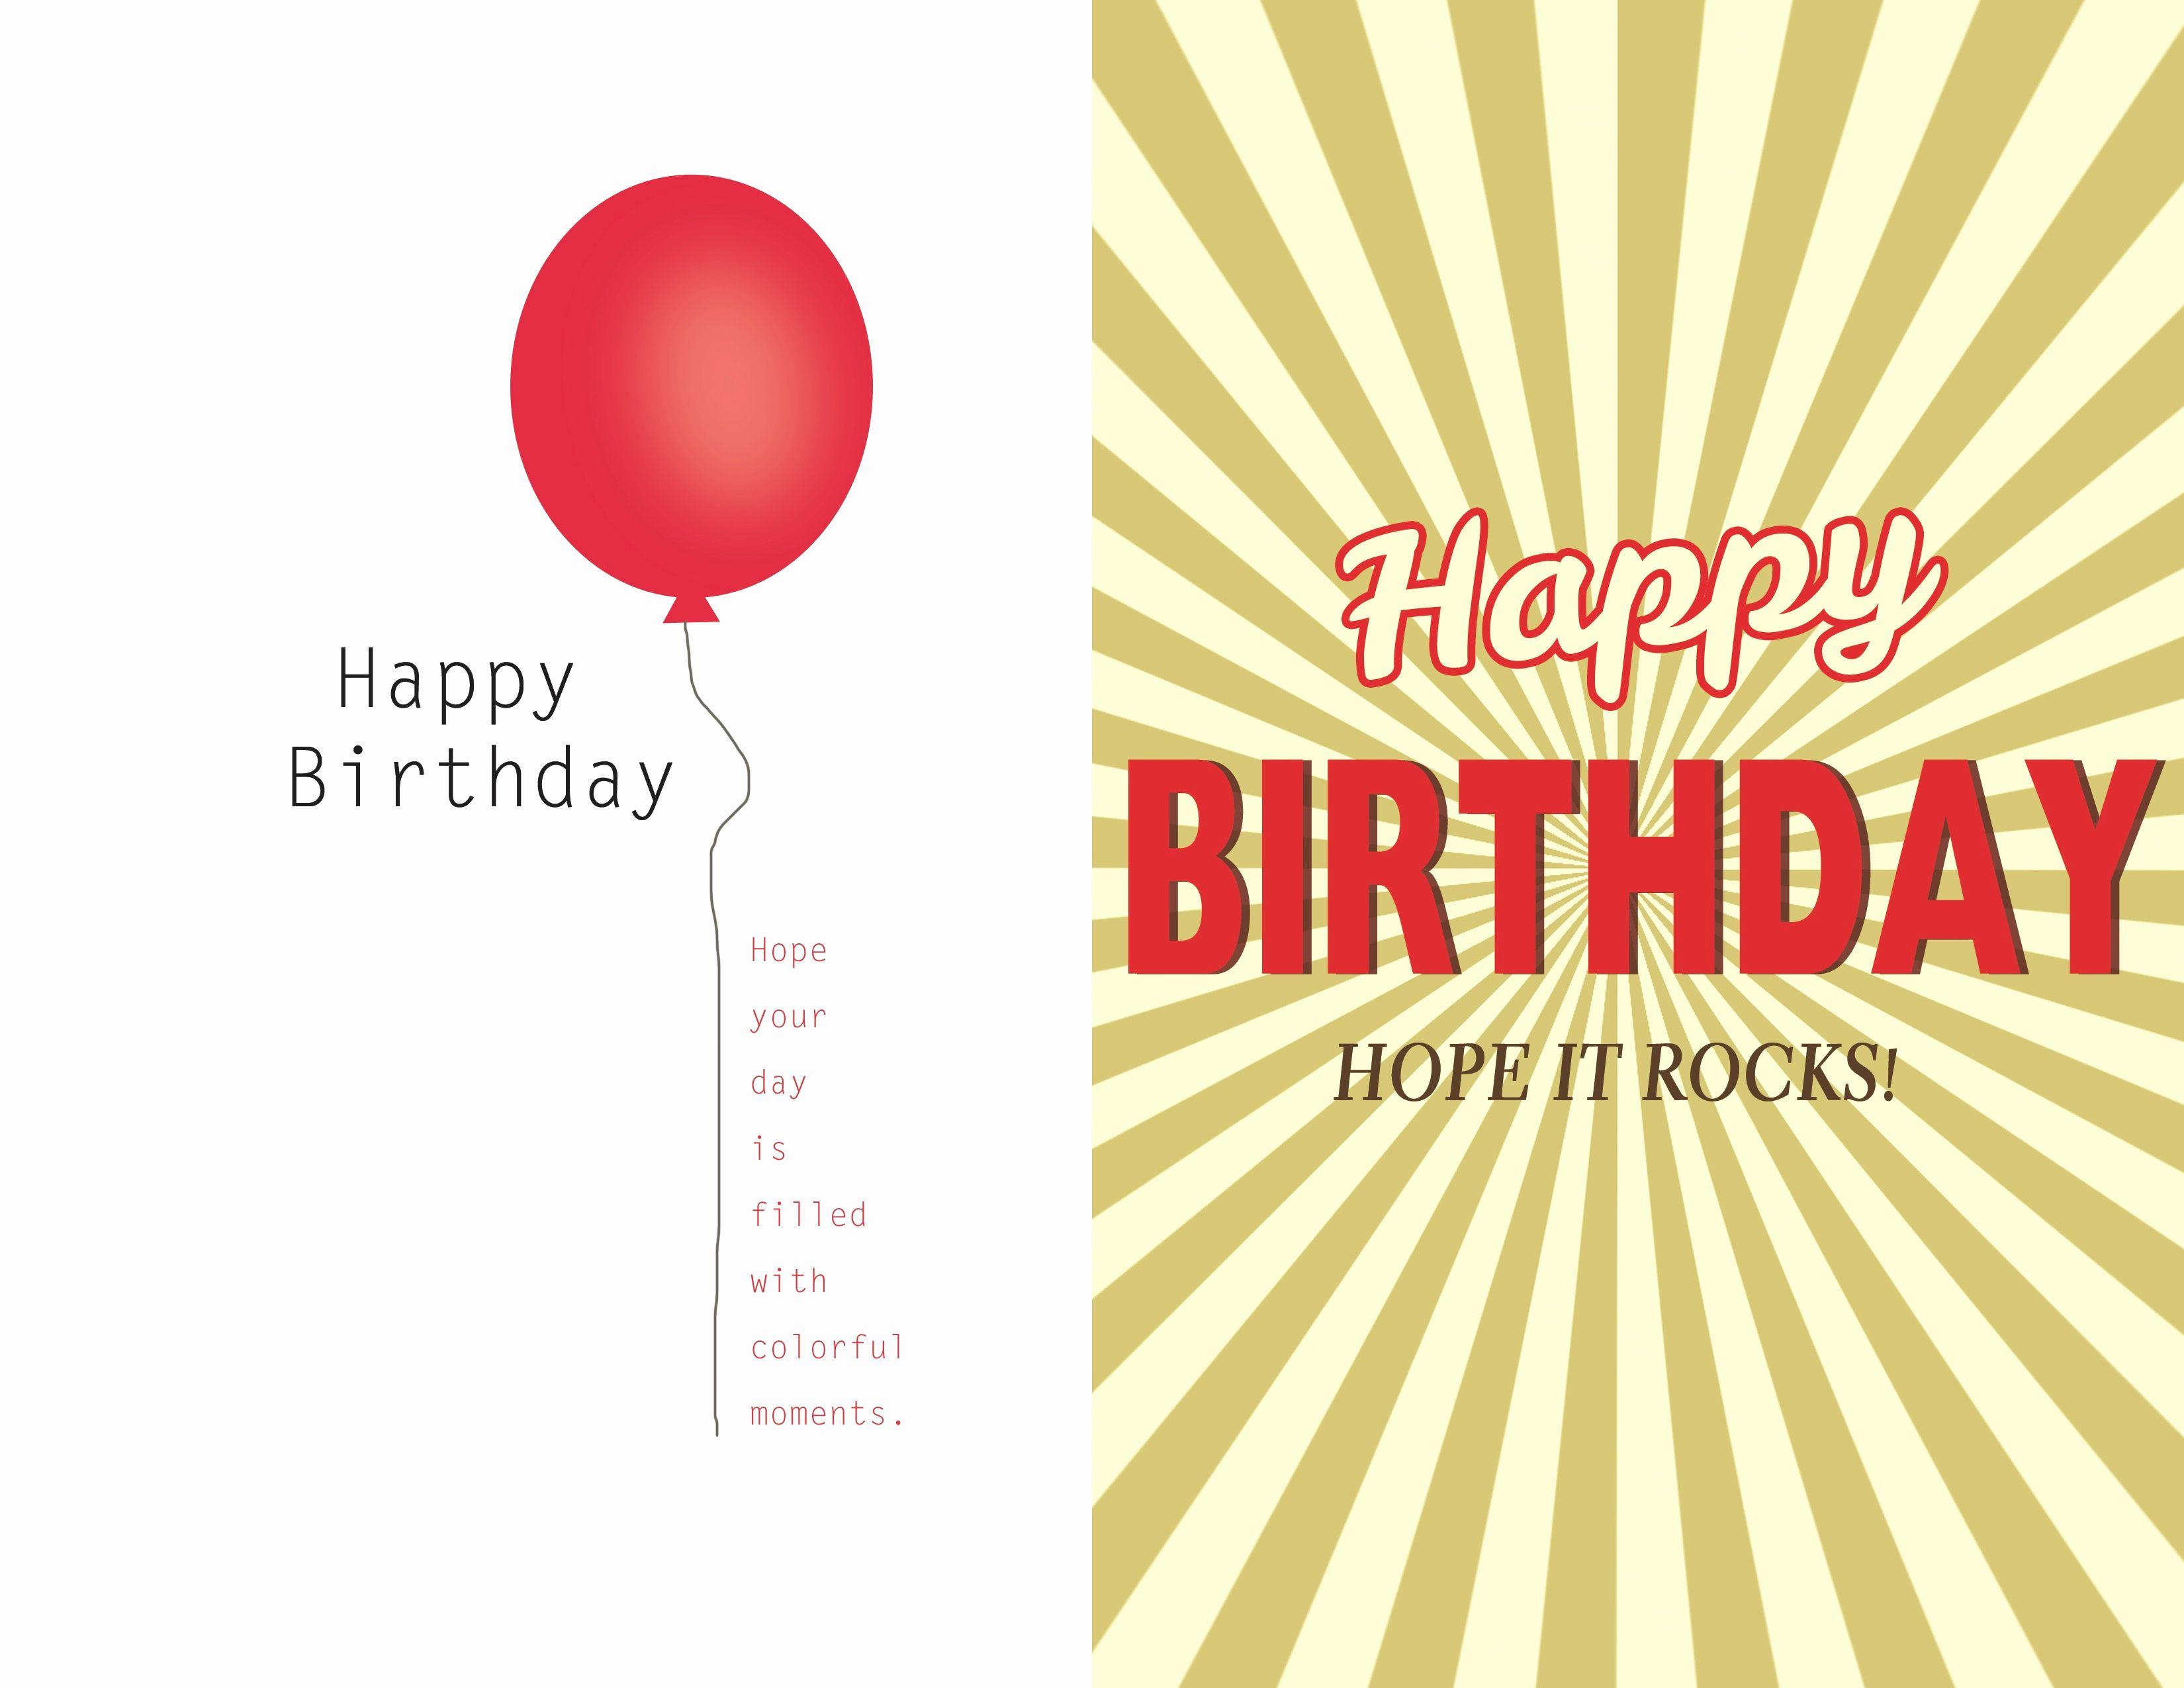 Happy Birthday Card Template Bedfordfarmersmkt For Quarter Fold Birthday Car Birthday Card Printable Birthday Card Template Free Free Greeting Card Templates